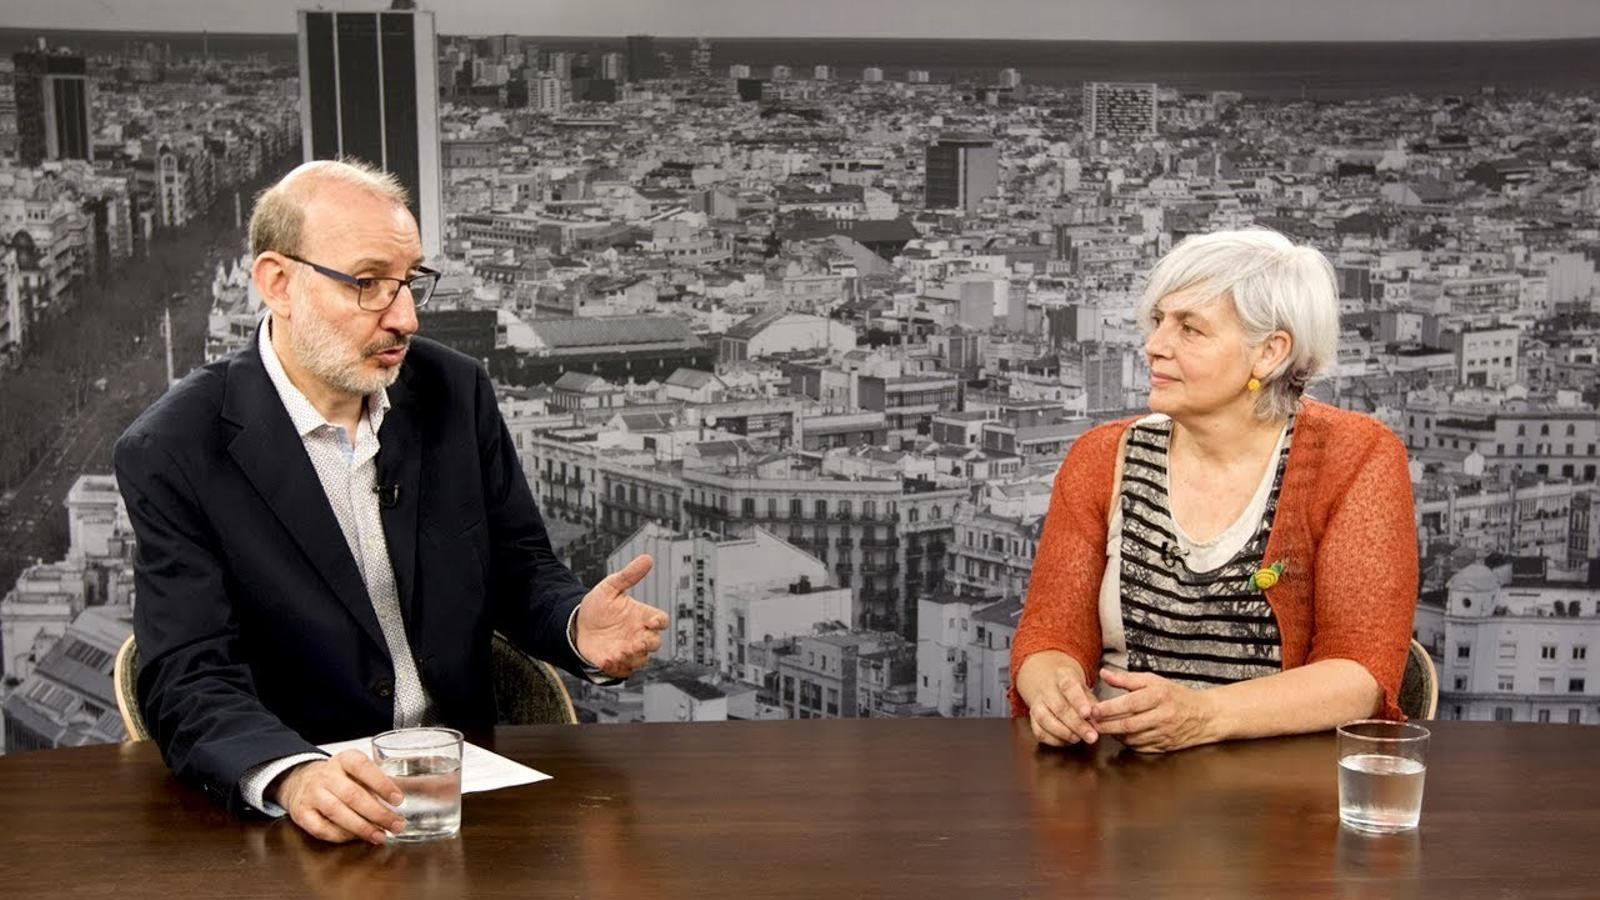 Entrevista d'Antoni Bassas a Dolors Sabater